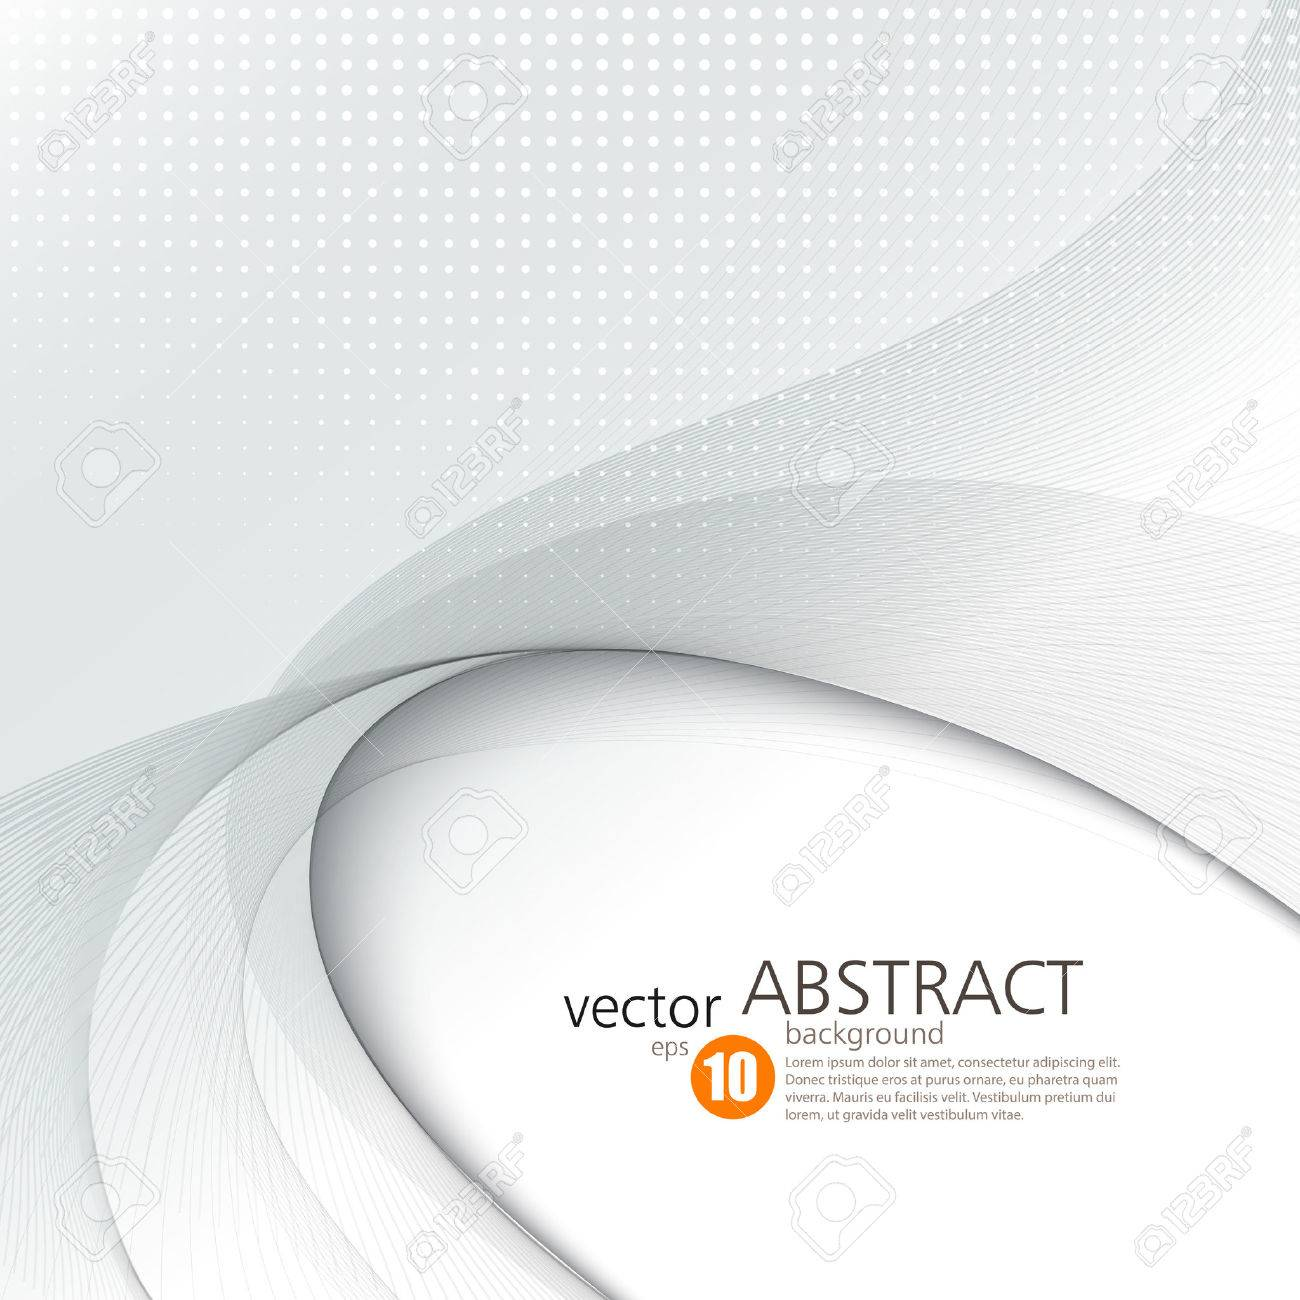 Abstract vector background, smooth waved lines for brochure, website, flyer design. illustration - 51754473